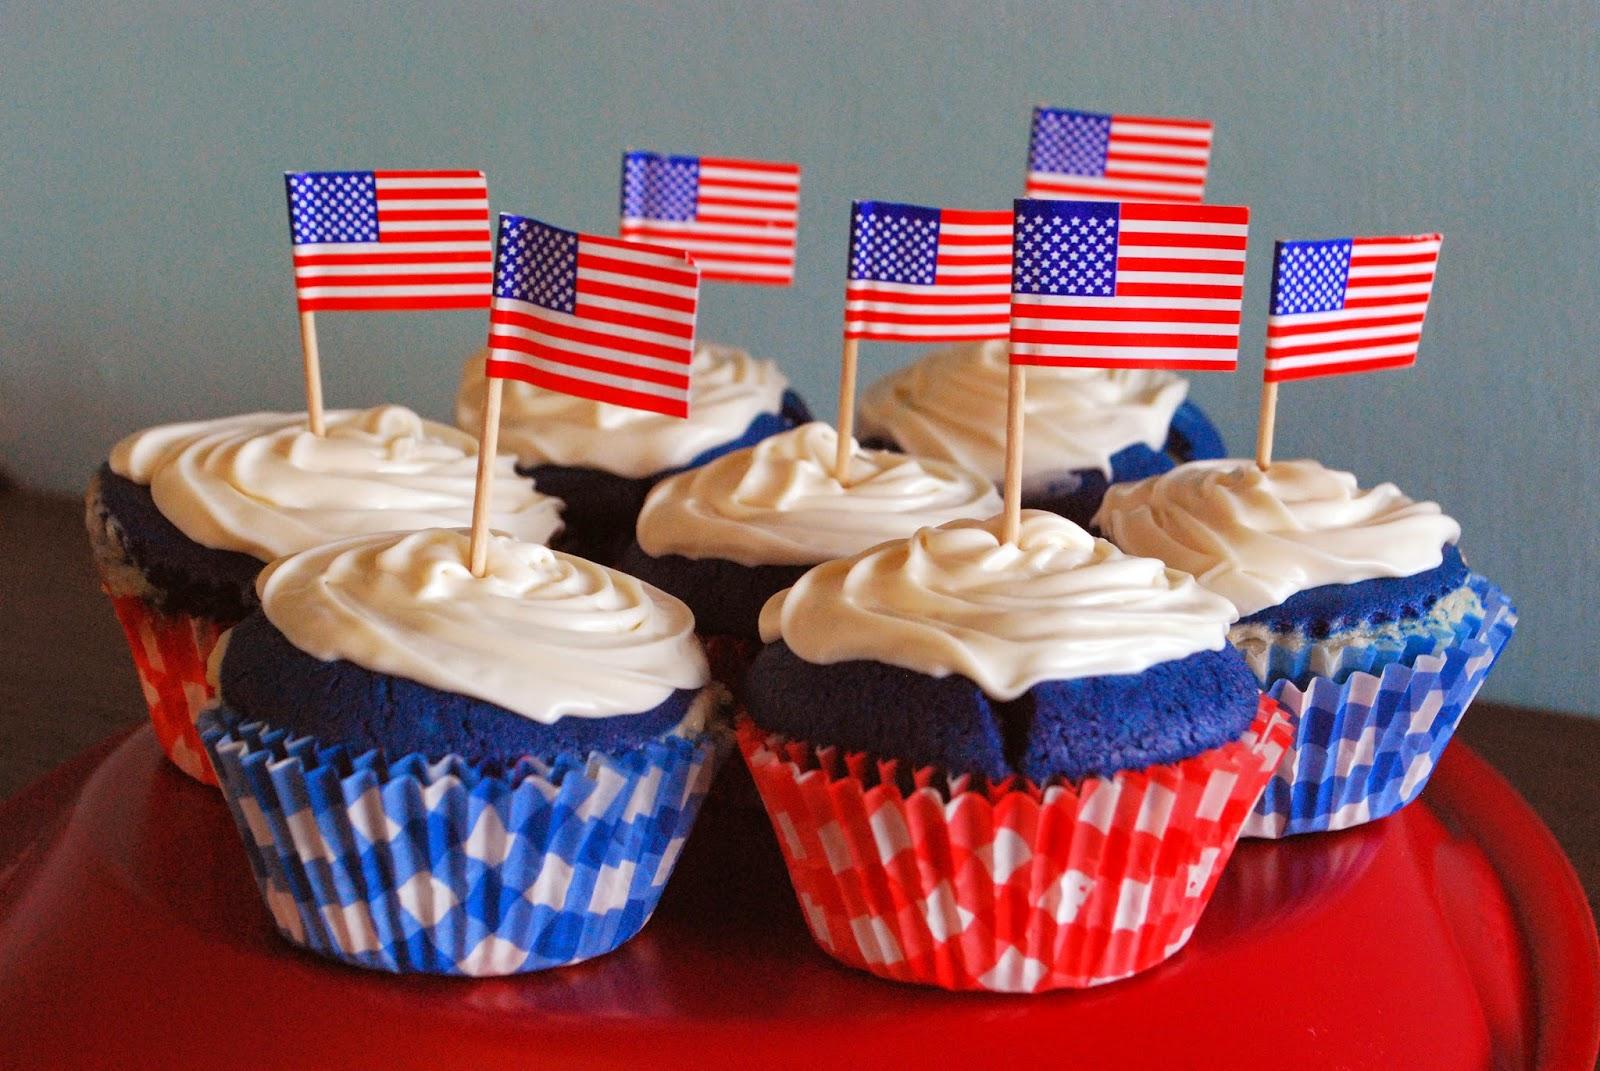 My Vegan Life - Celebrating the 4th of July